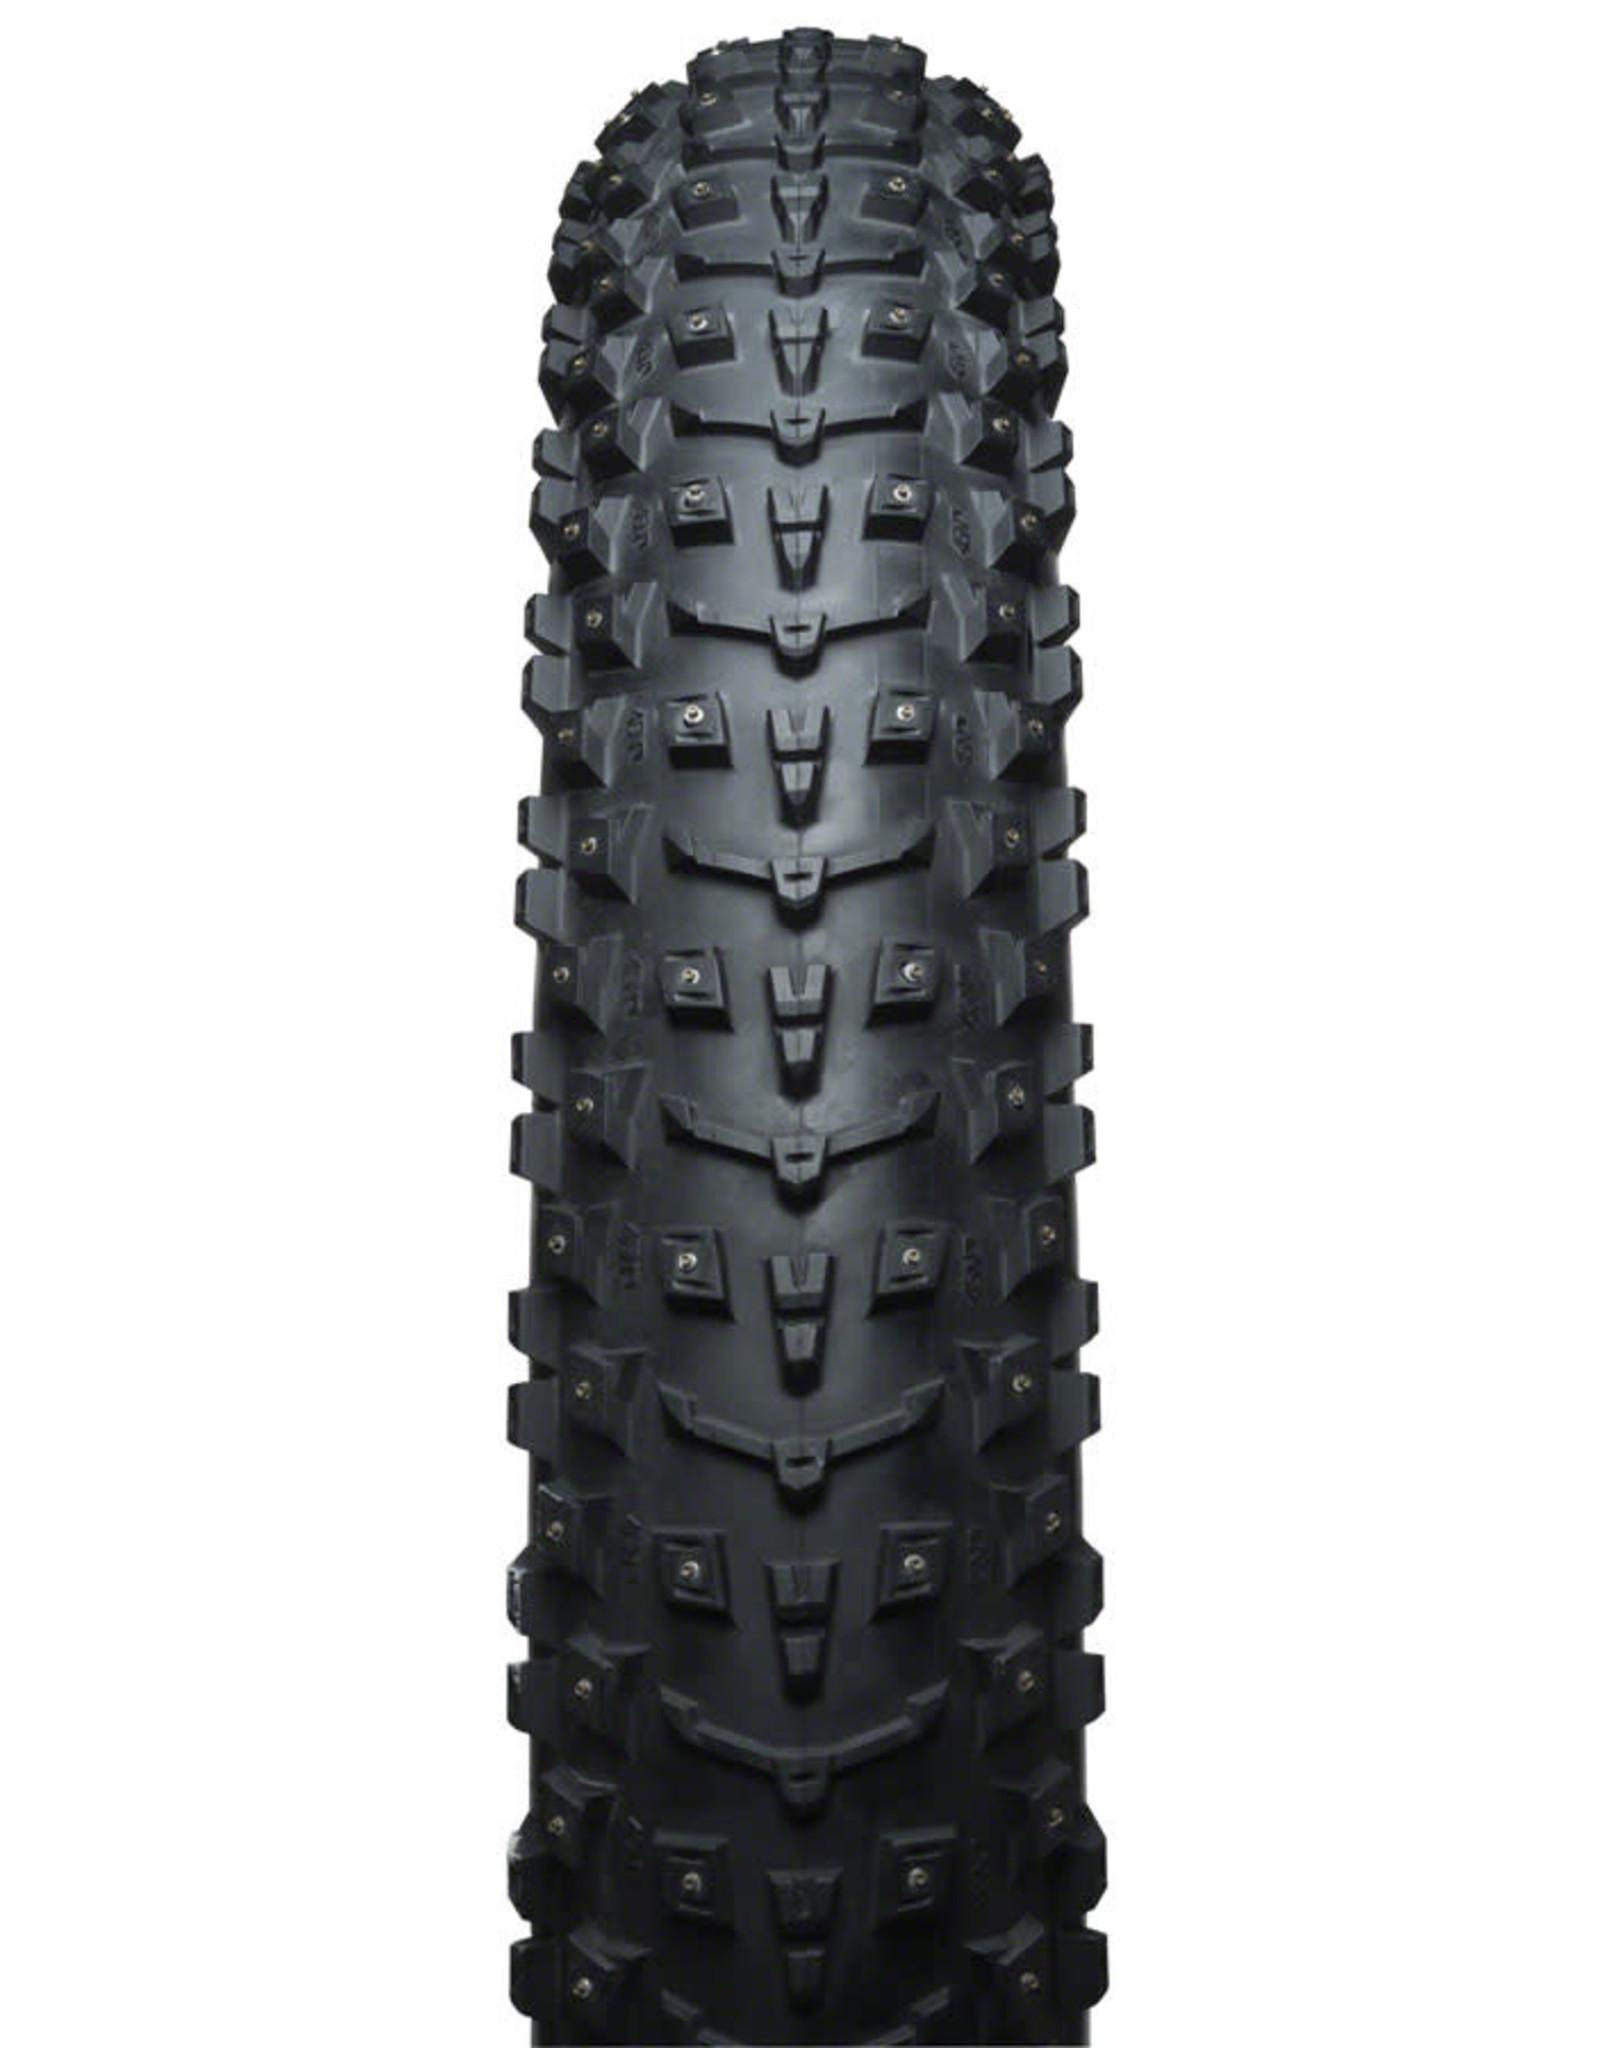 45NRTH 45NRTH Dillinger 5 Tire - 26 x 4.6, Tubeless, Folding, Black, 60tpi, 258 Carbide Steel Studs